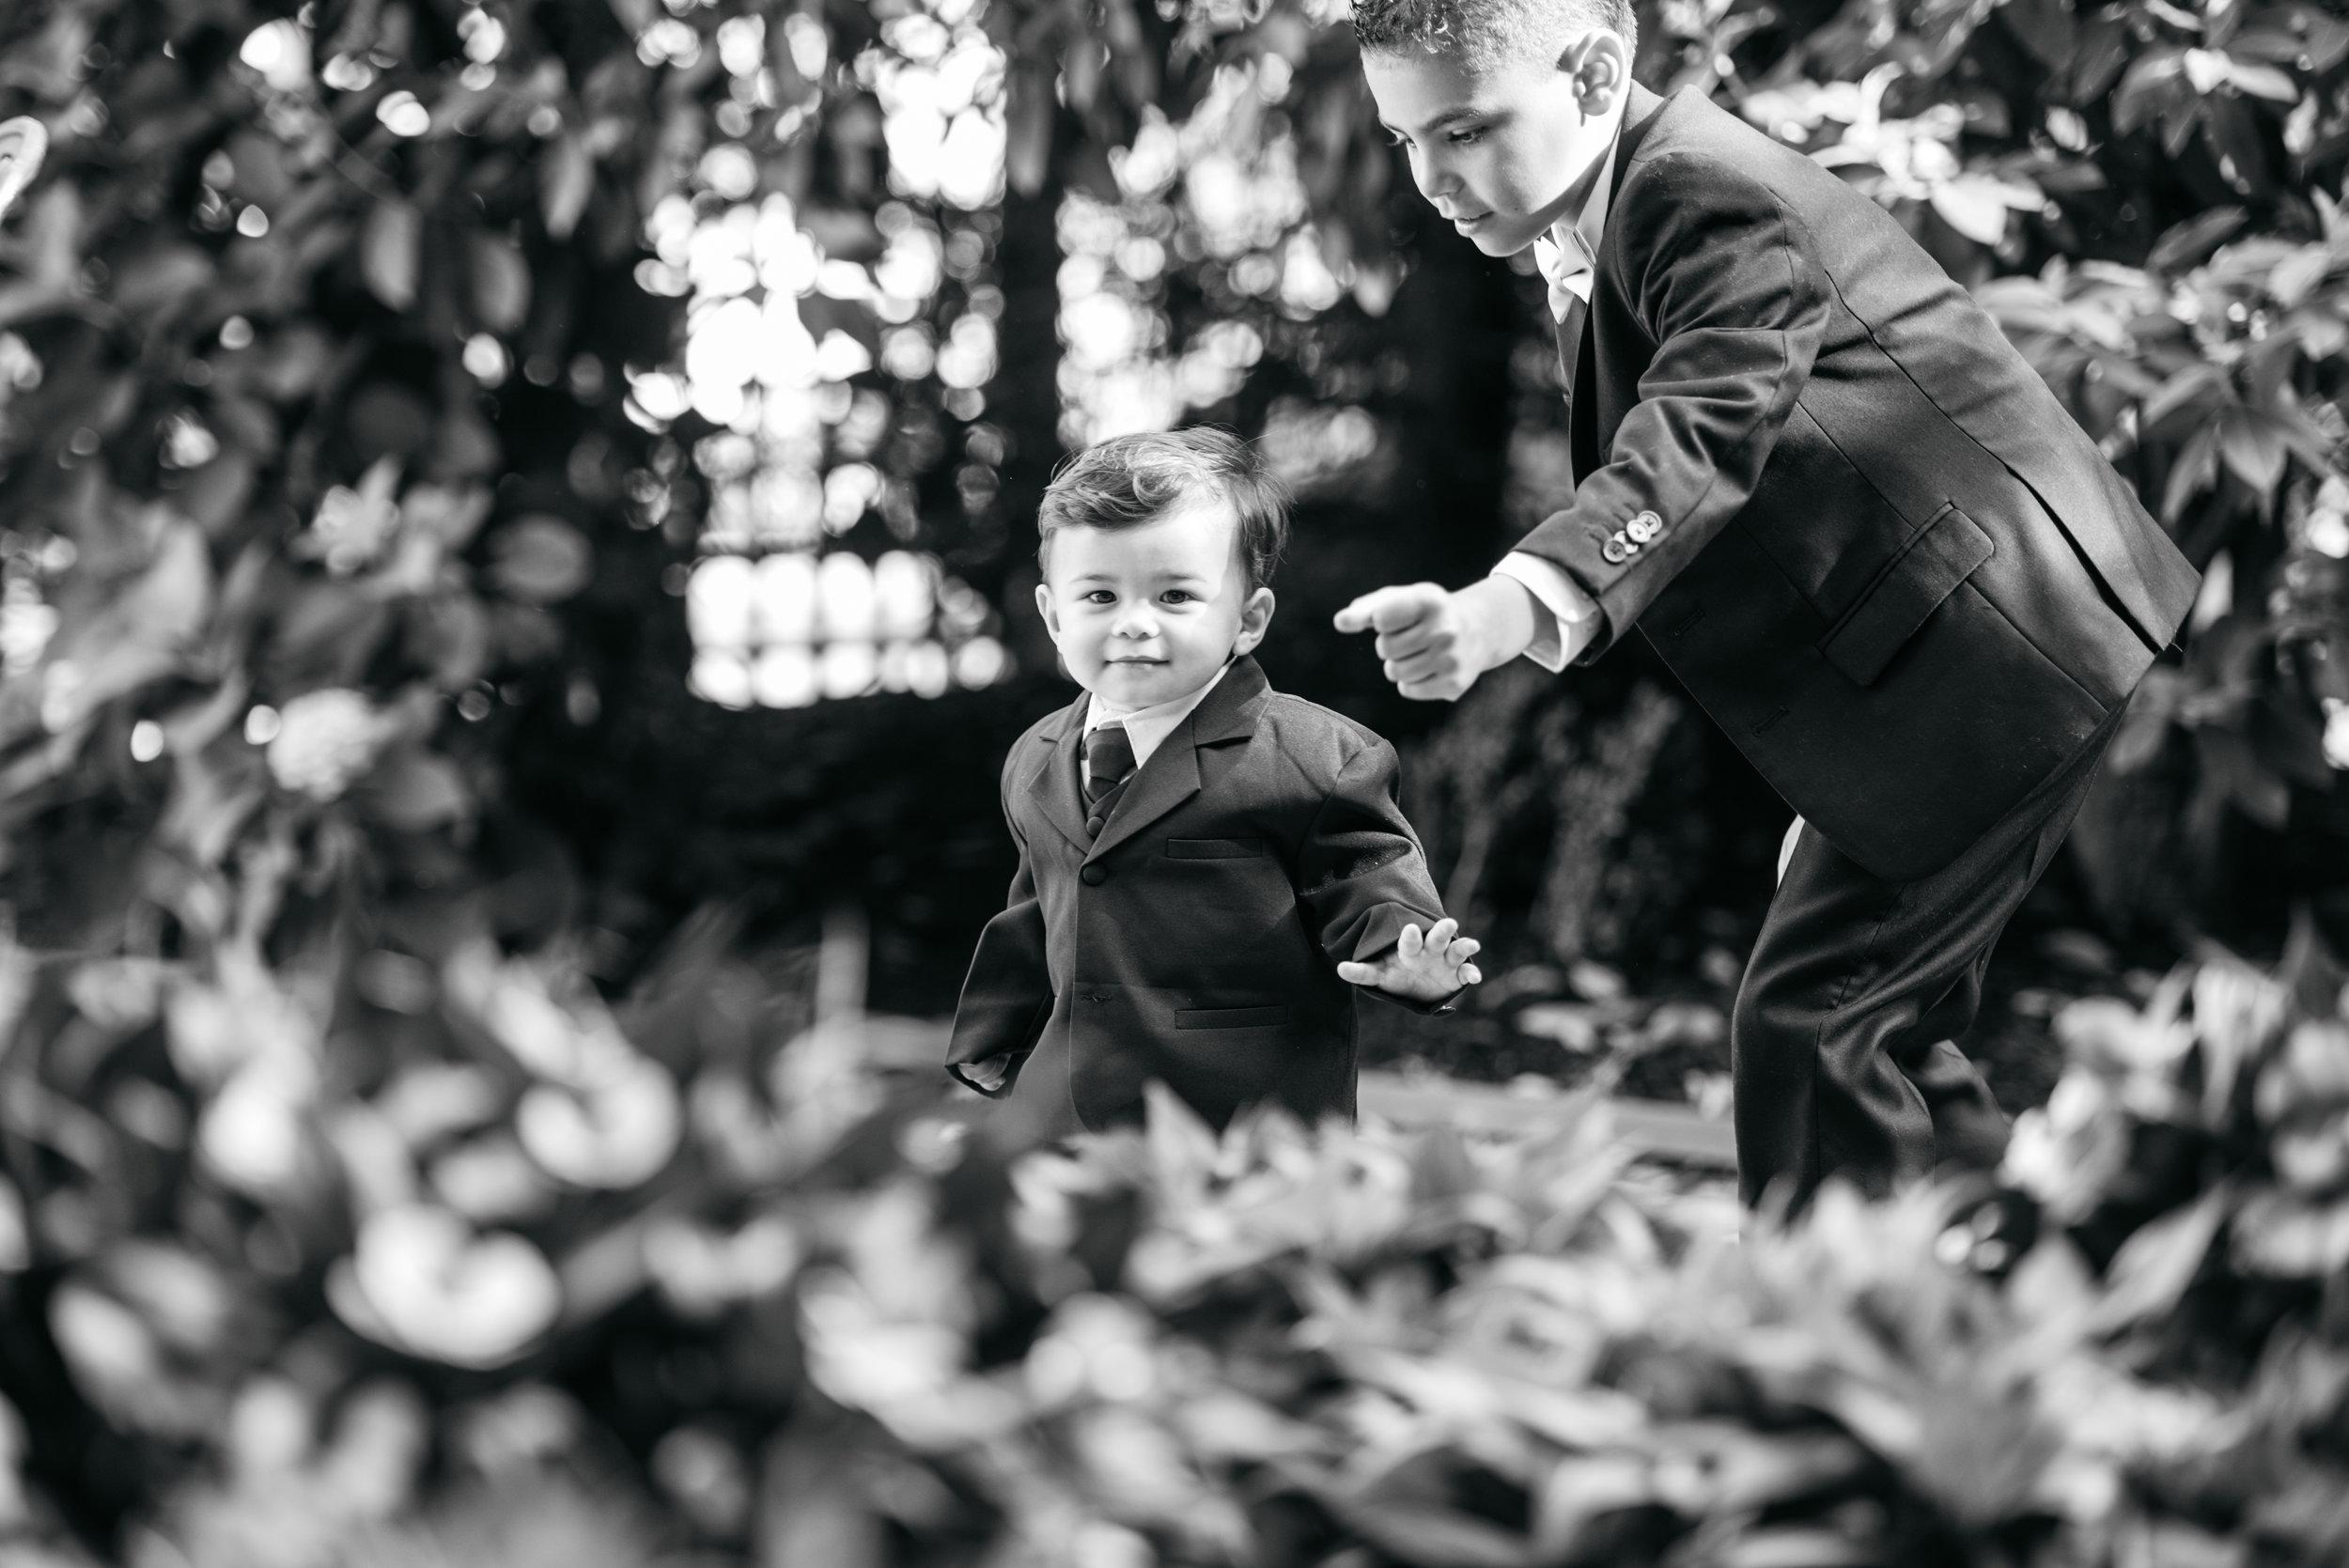 WeddingPhotos | NJPhotographer | Highlights-7-10.jpg